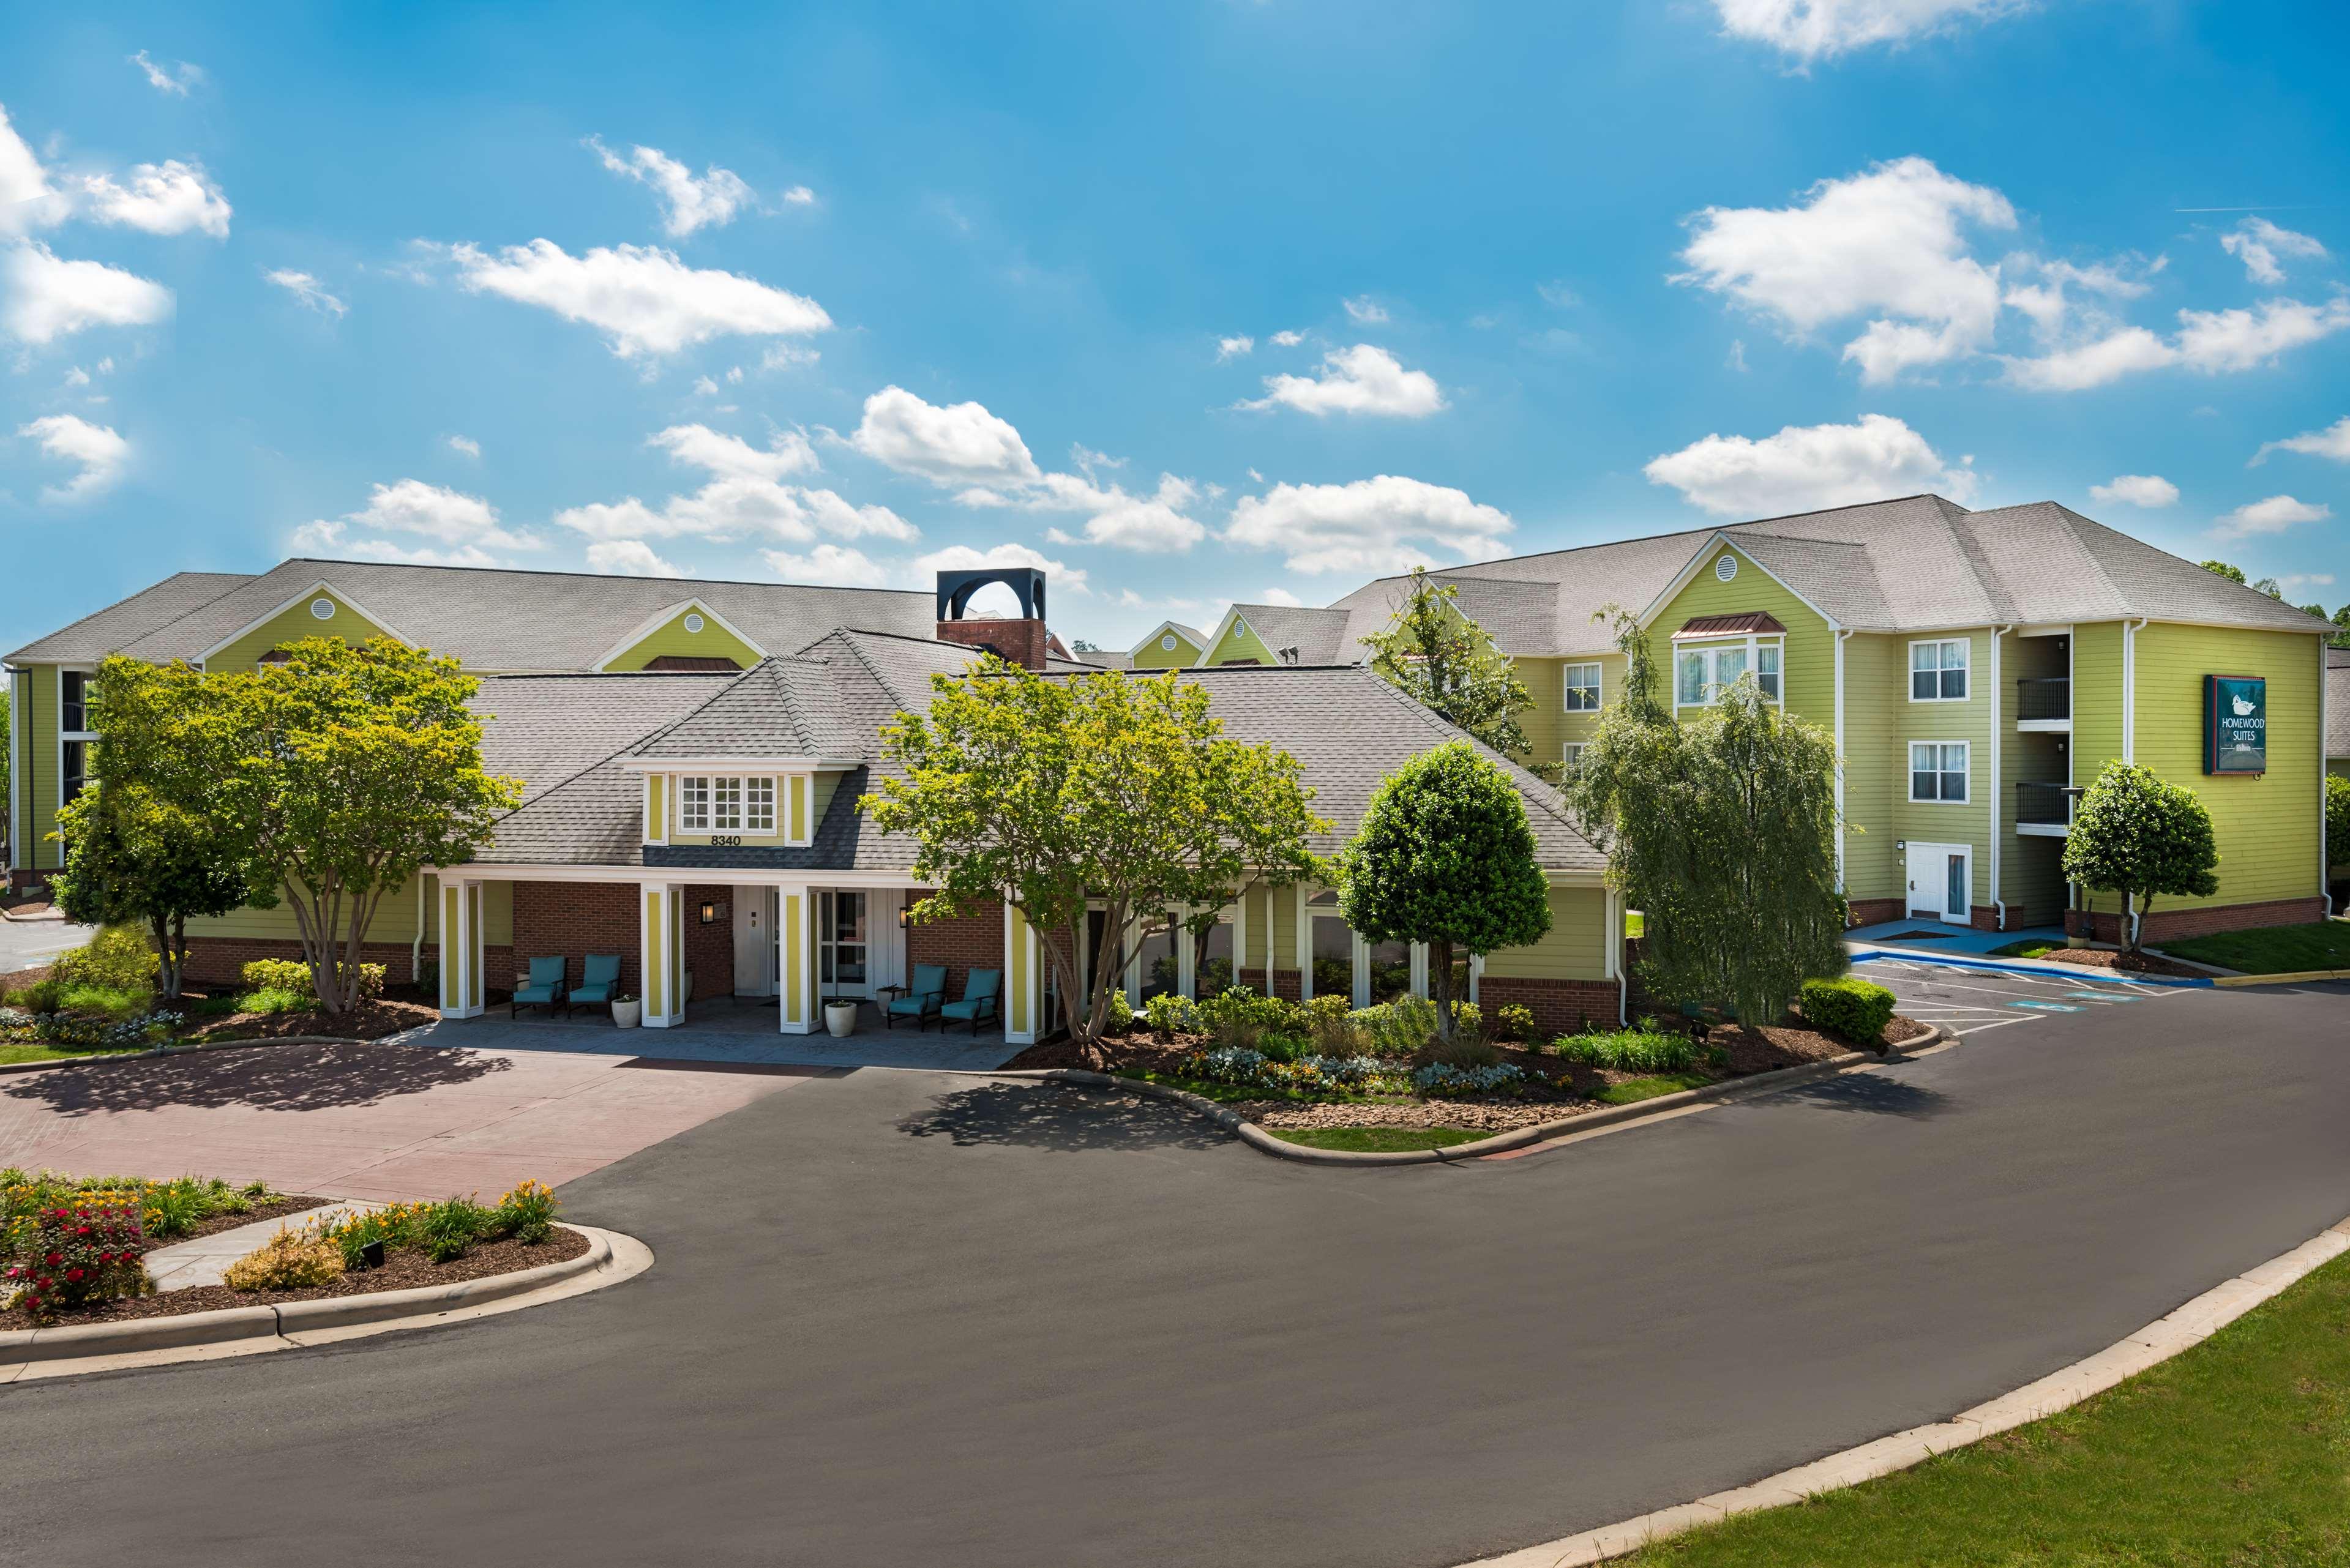 Homewood Suites by Hilton Charlotte-North/Univ Research Park image 2